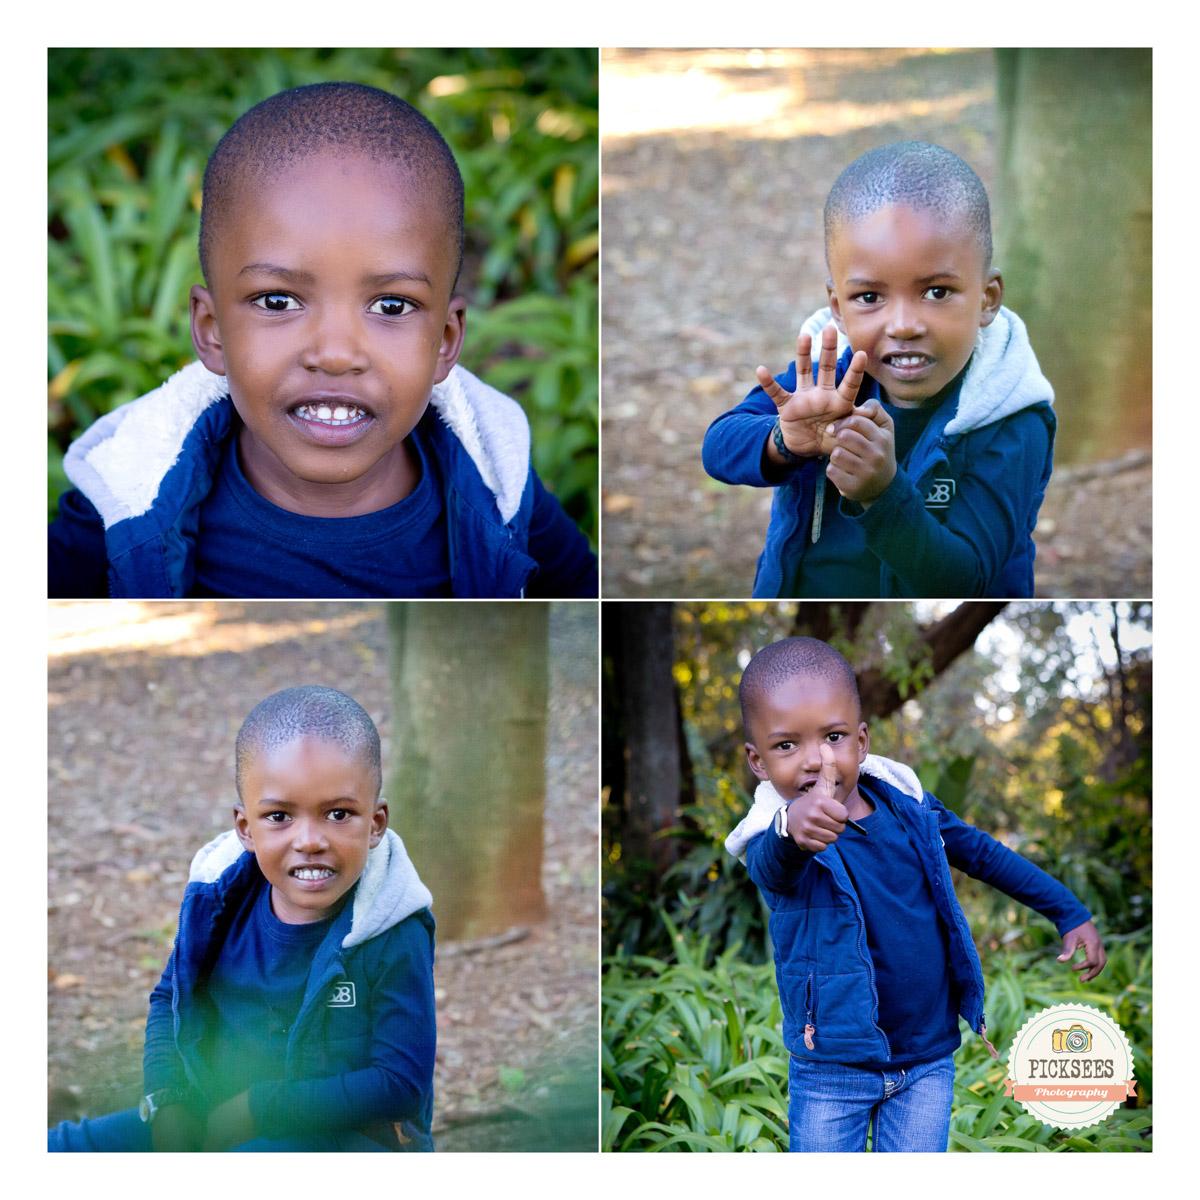 Pretoria_East_Children_s_photographer